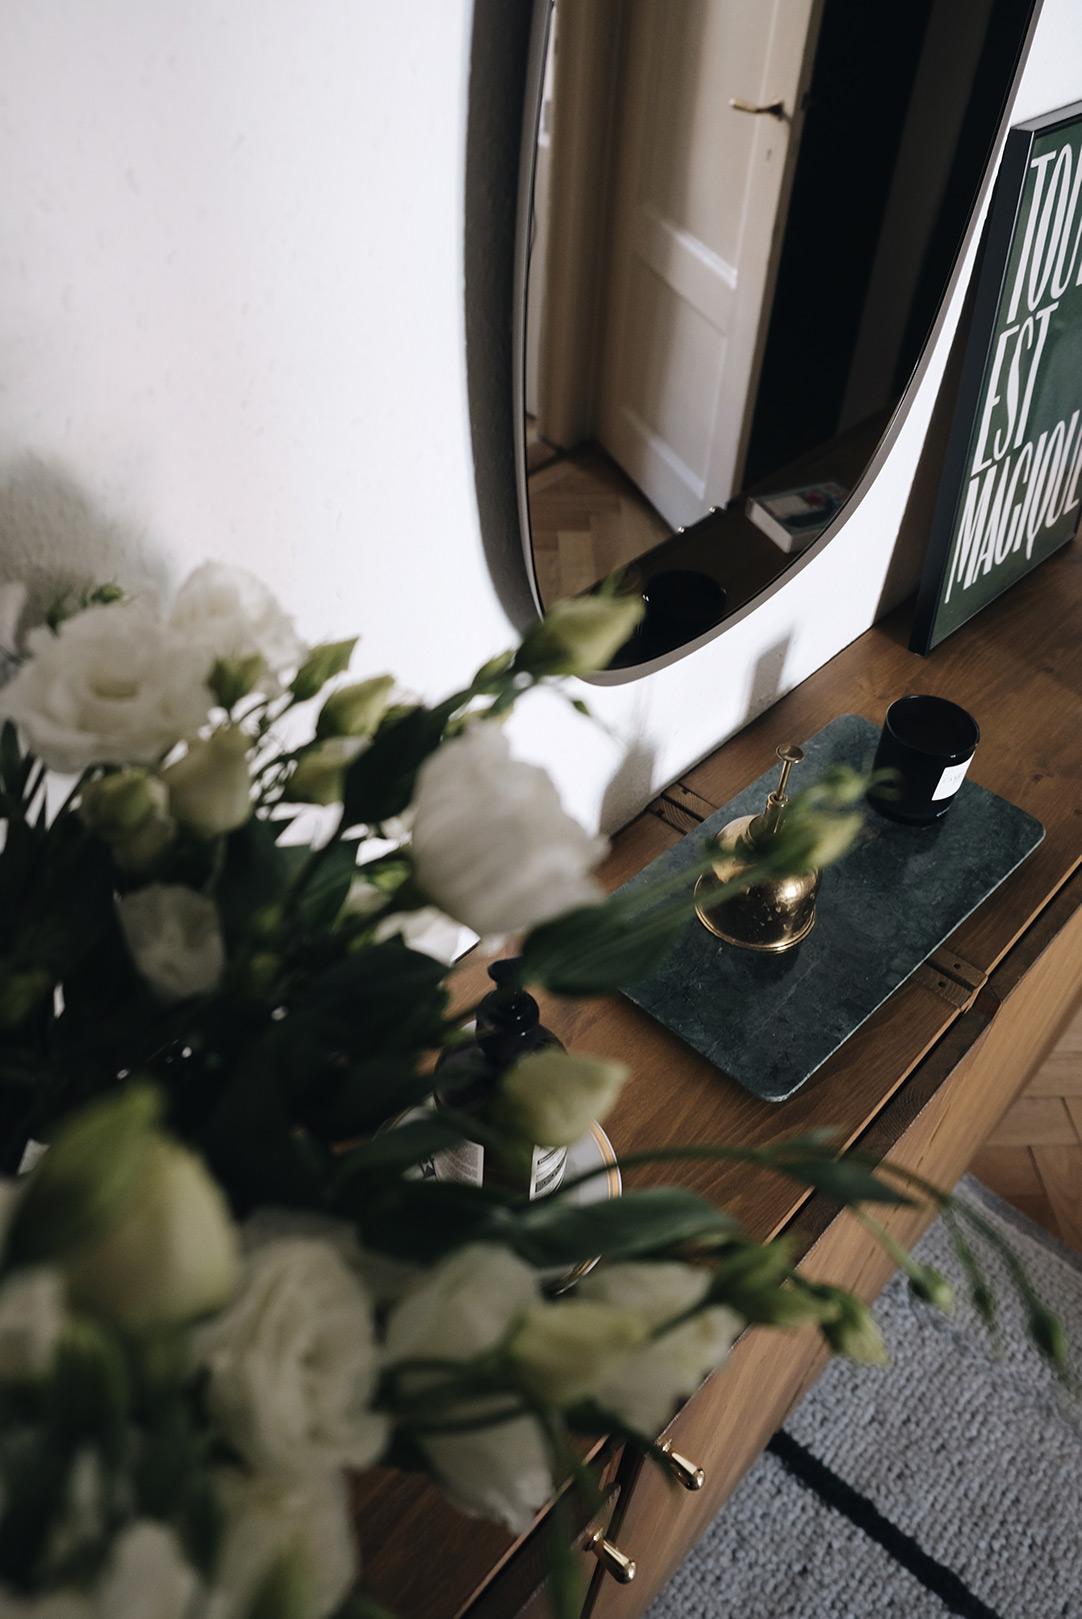 staining ikea ivar cabinets